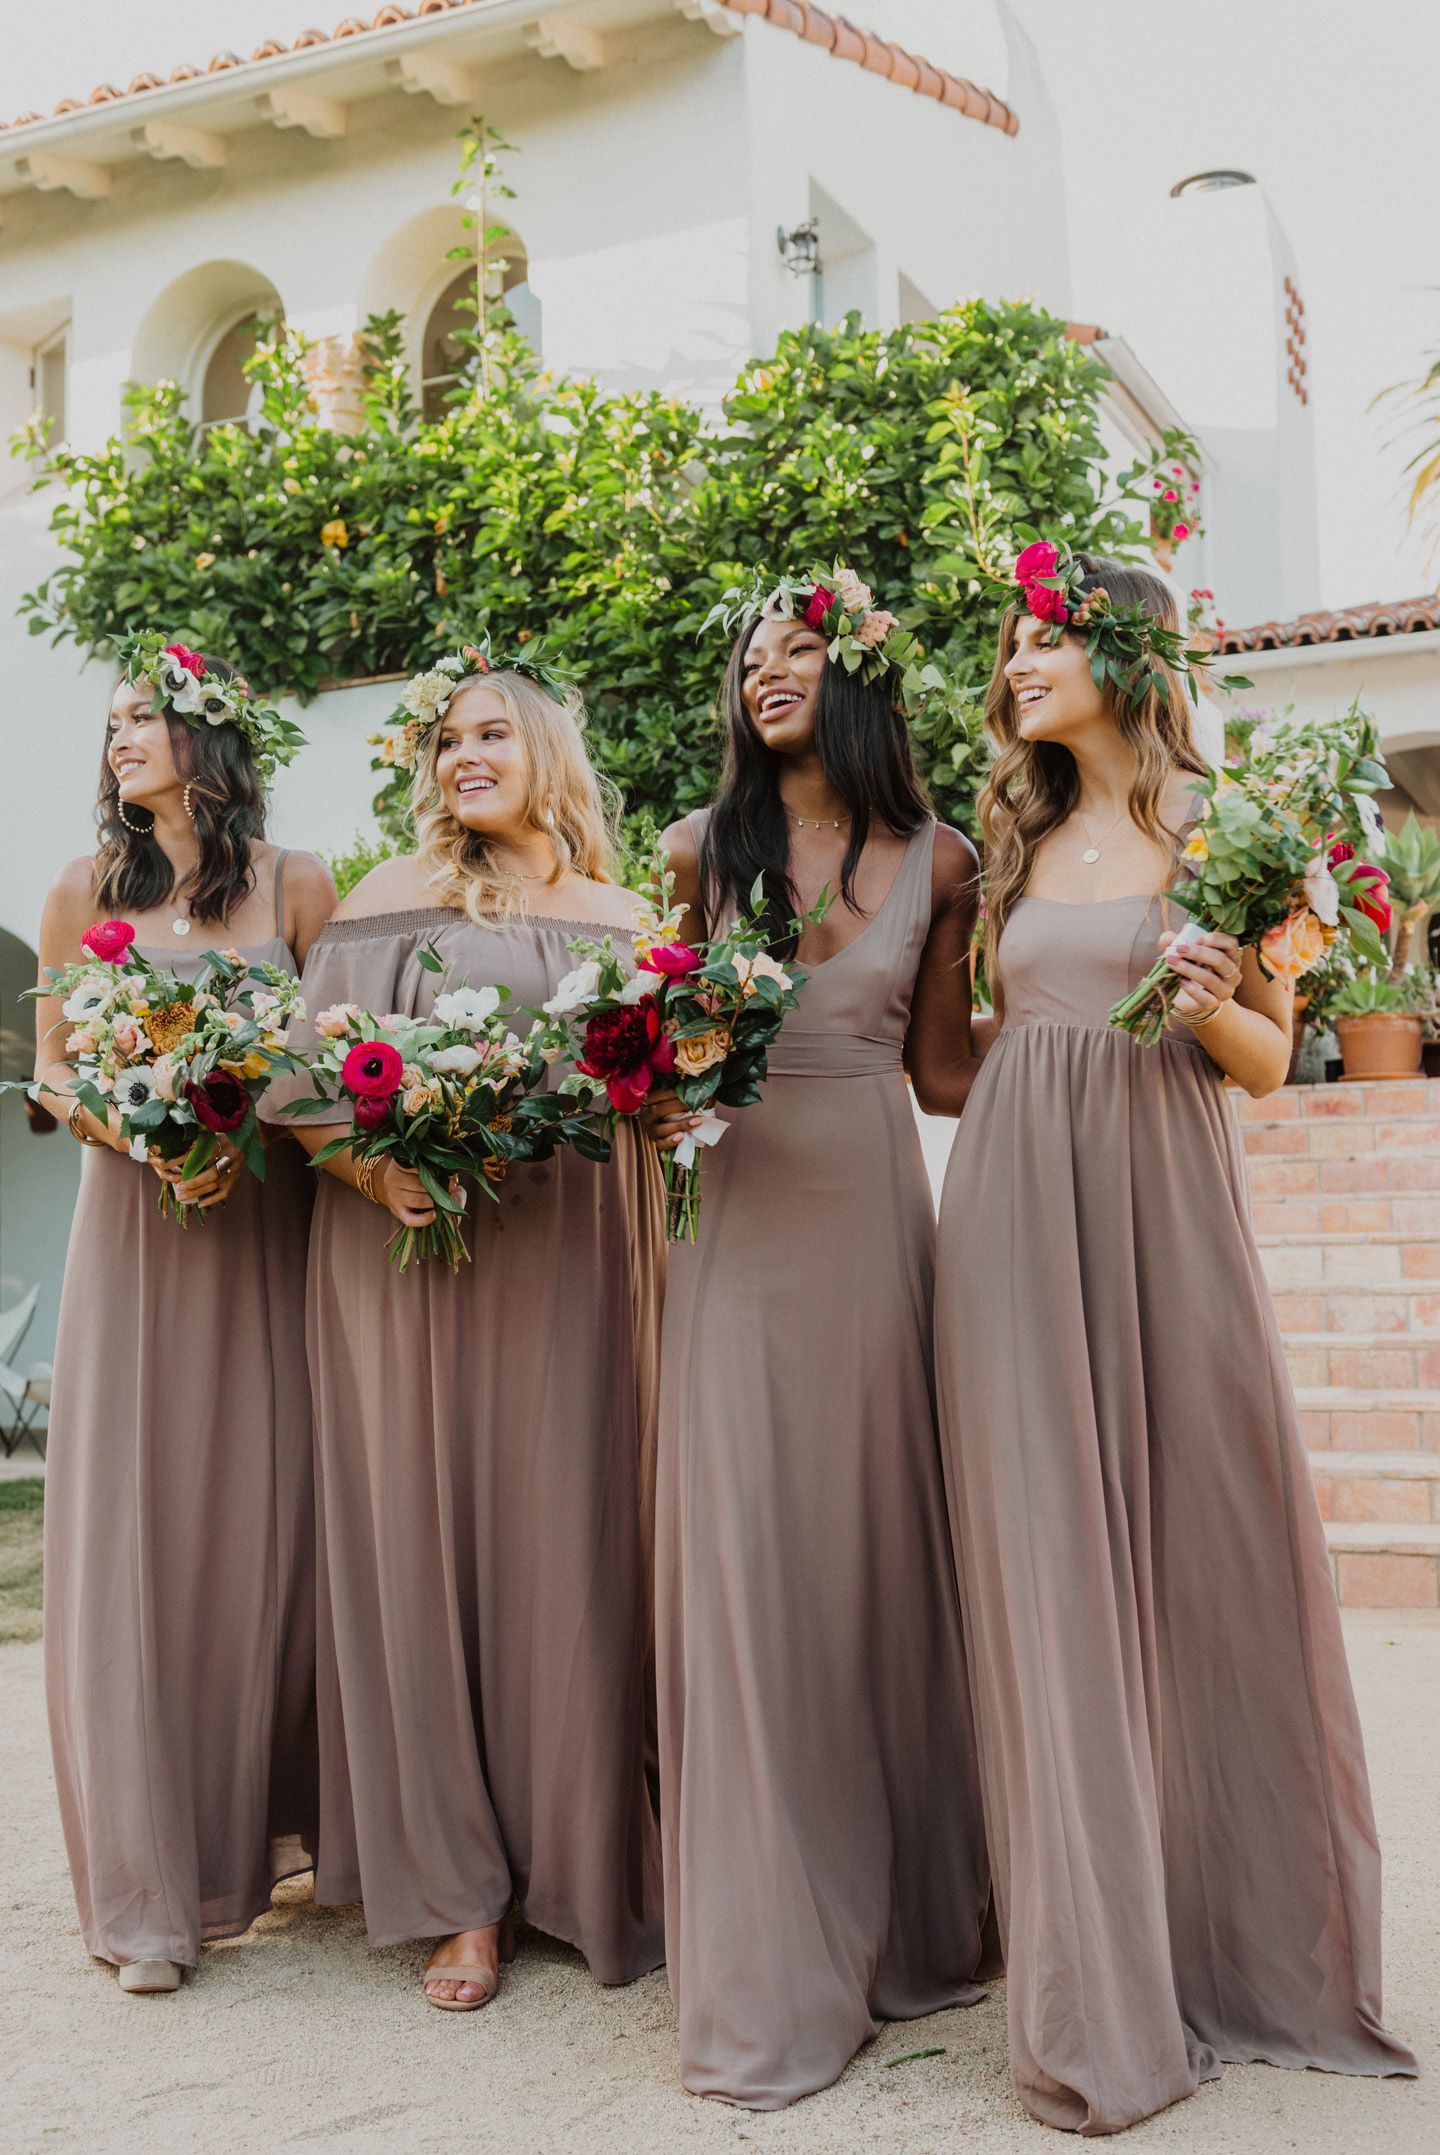 Show Me Your Mumu Mumu Weddings Spring Bridal 2020 Latest Bridesmaid Dresses Bridesmaid Dress Colors Boho Style Wedding